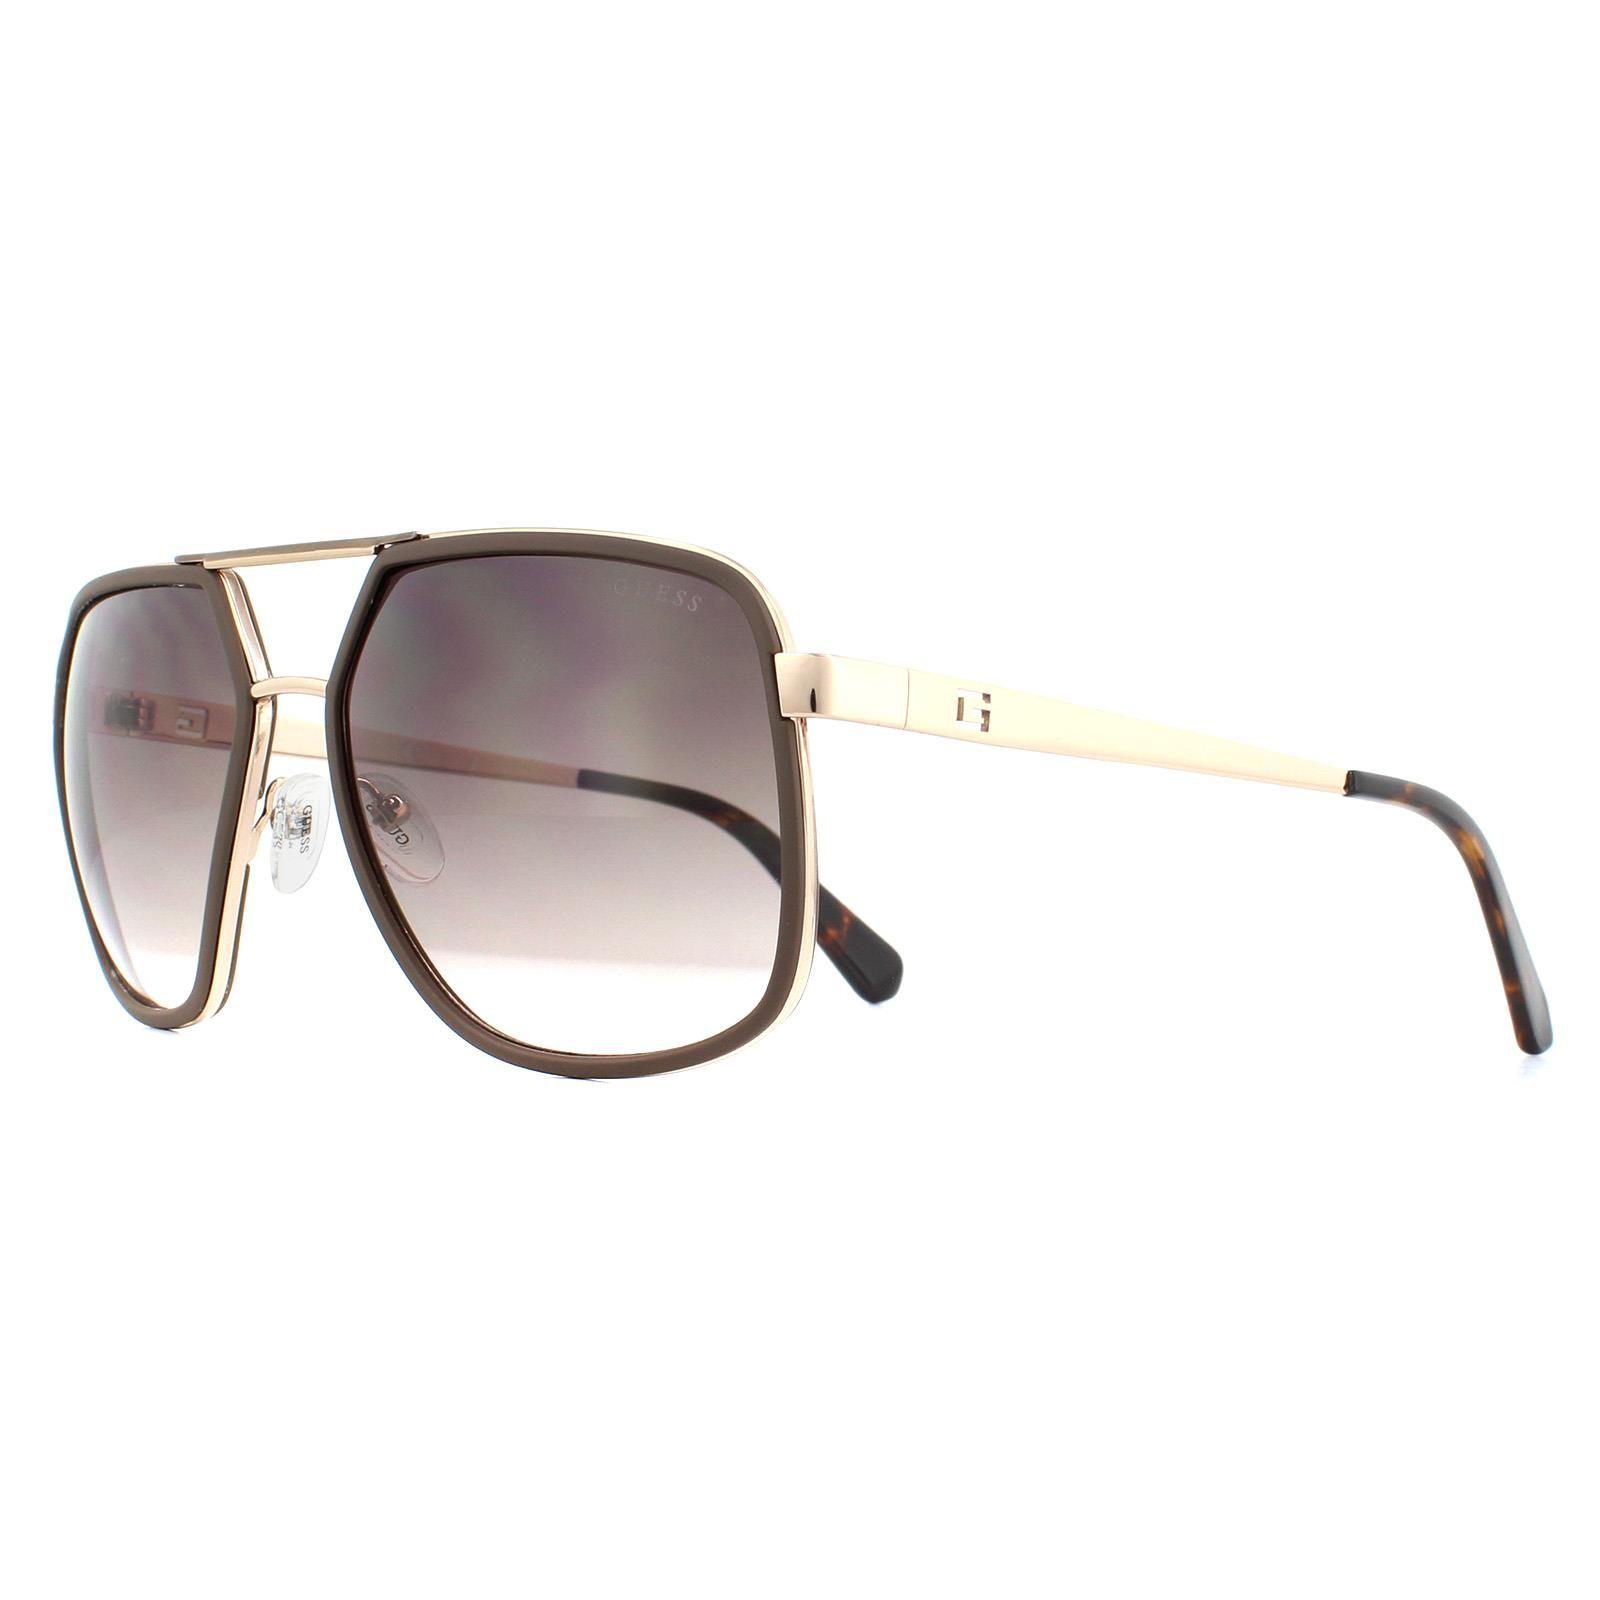 Guess Sunglasses GU6978 50F Dark Havana Brown Gradient